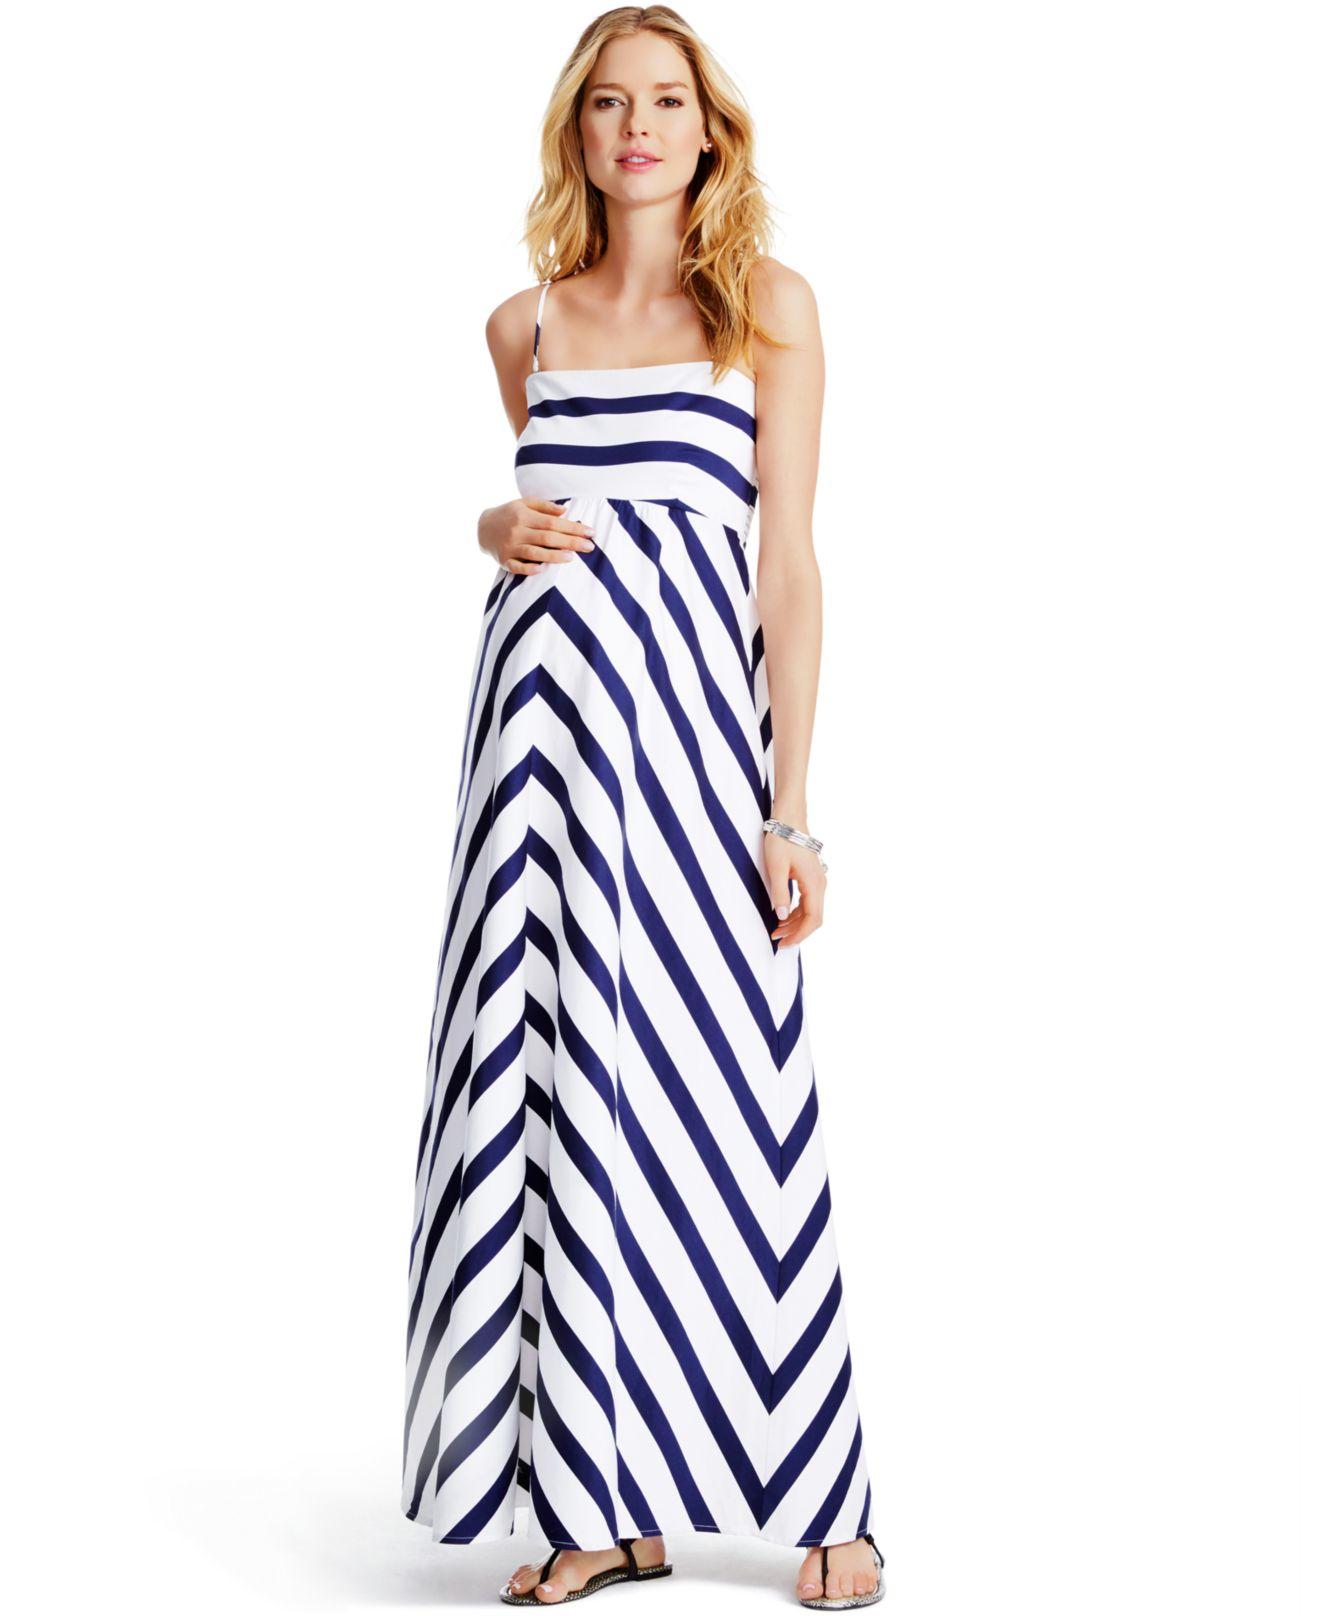 5a8d640e953 Jessica Simpson Maternity Striped Maxi Dress in White - Lyst